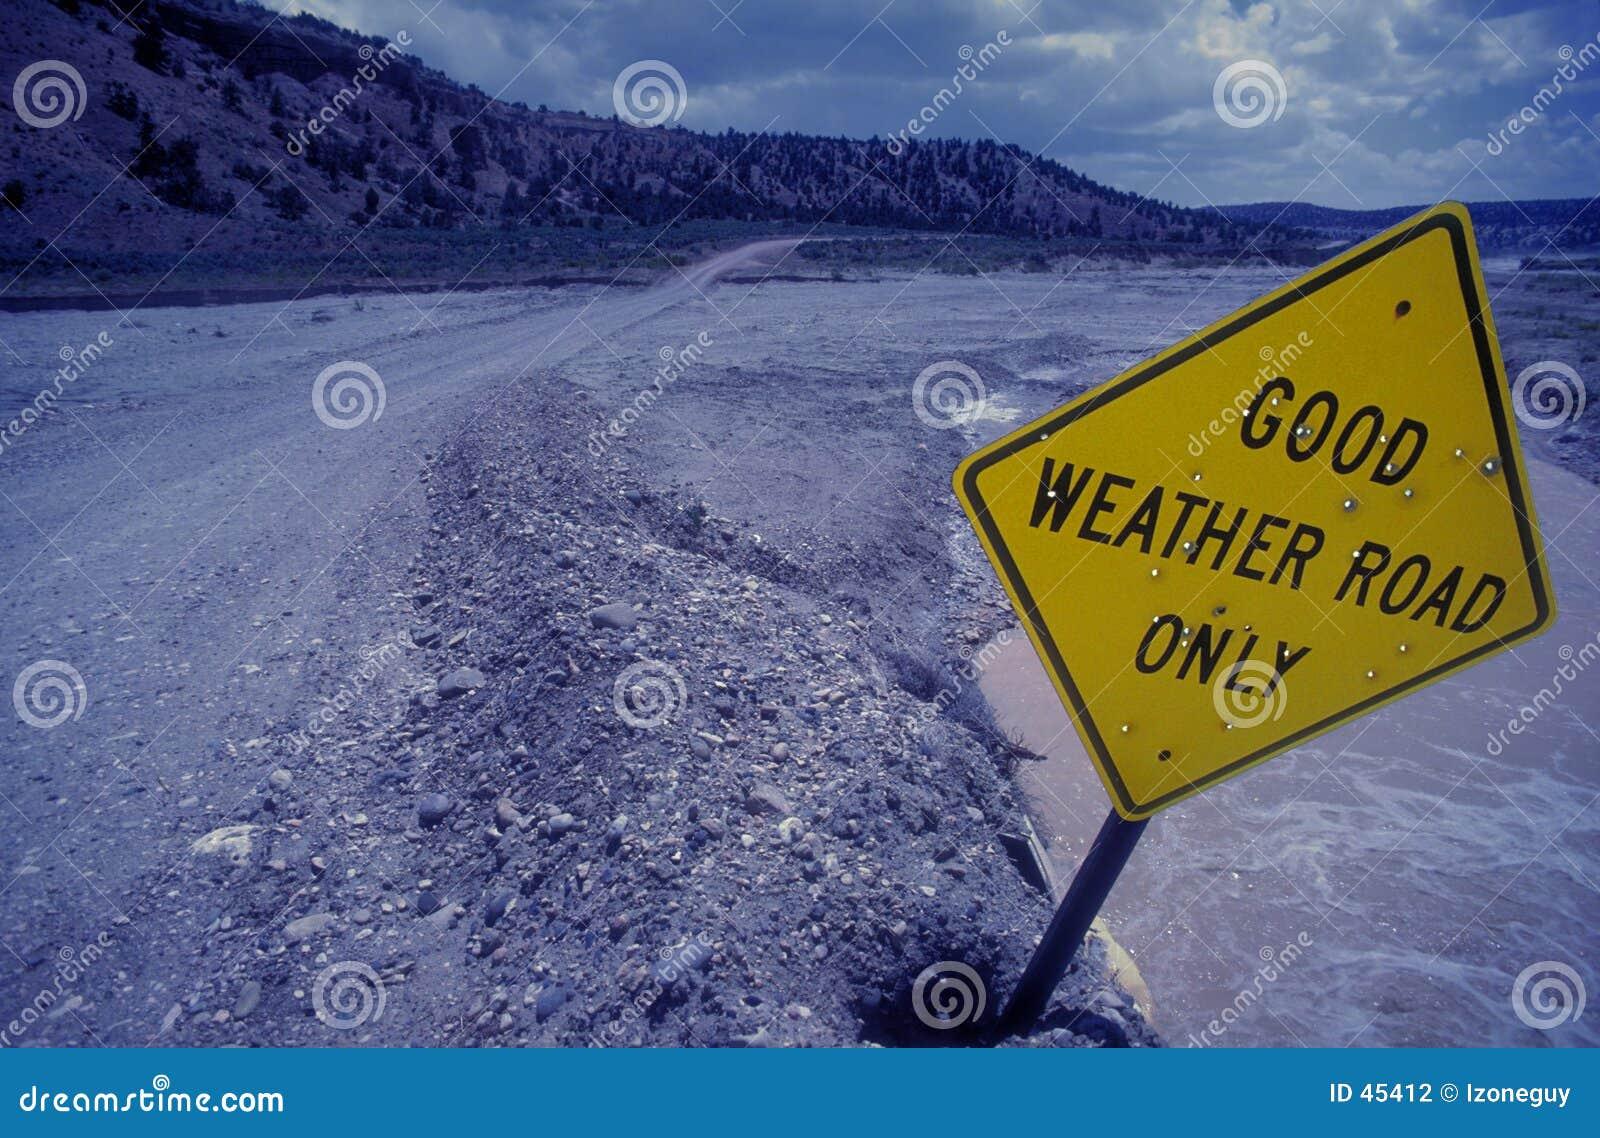 Good Weather Road